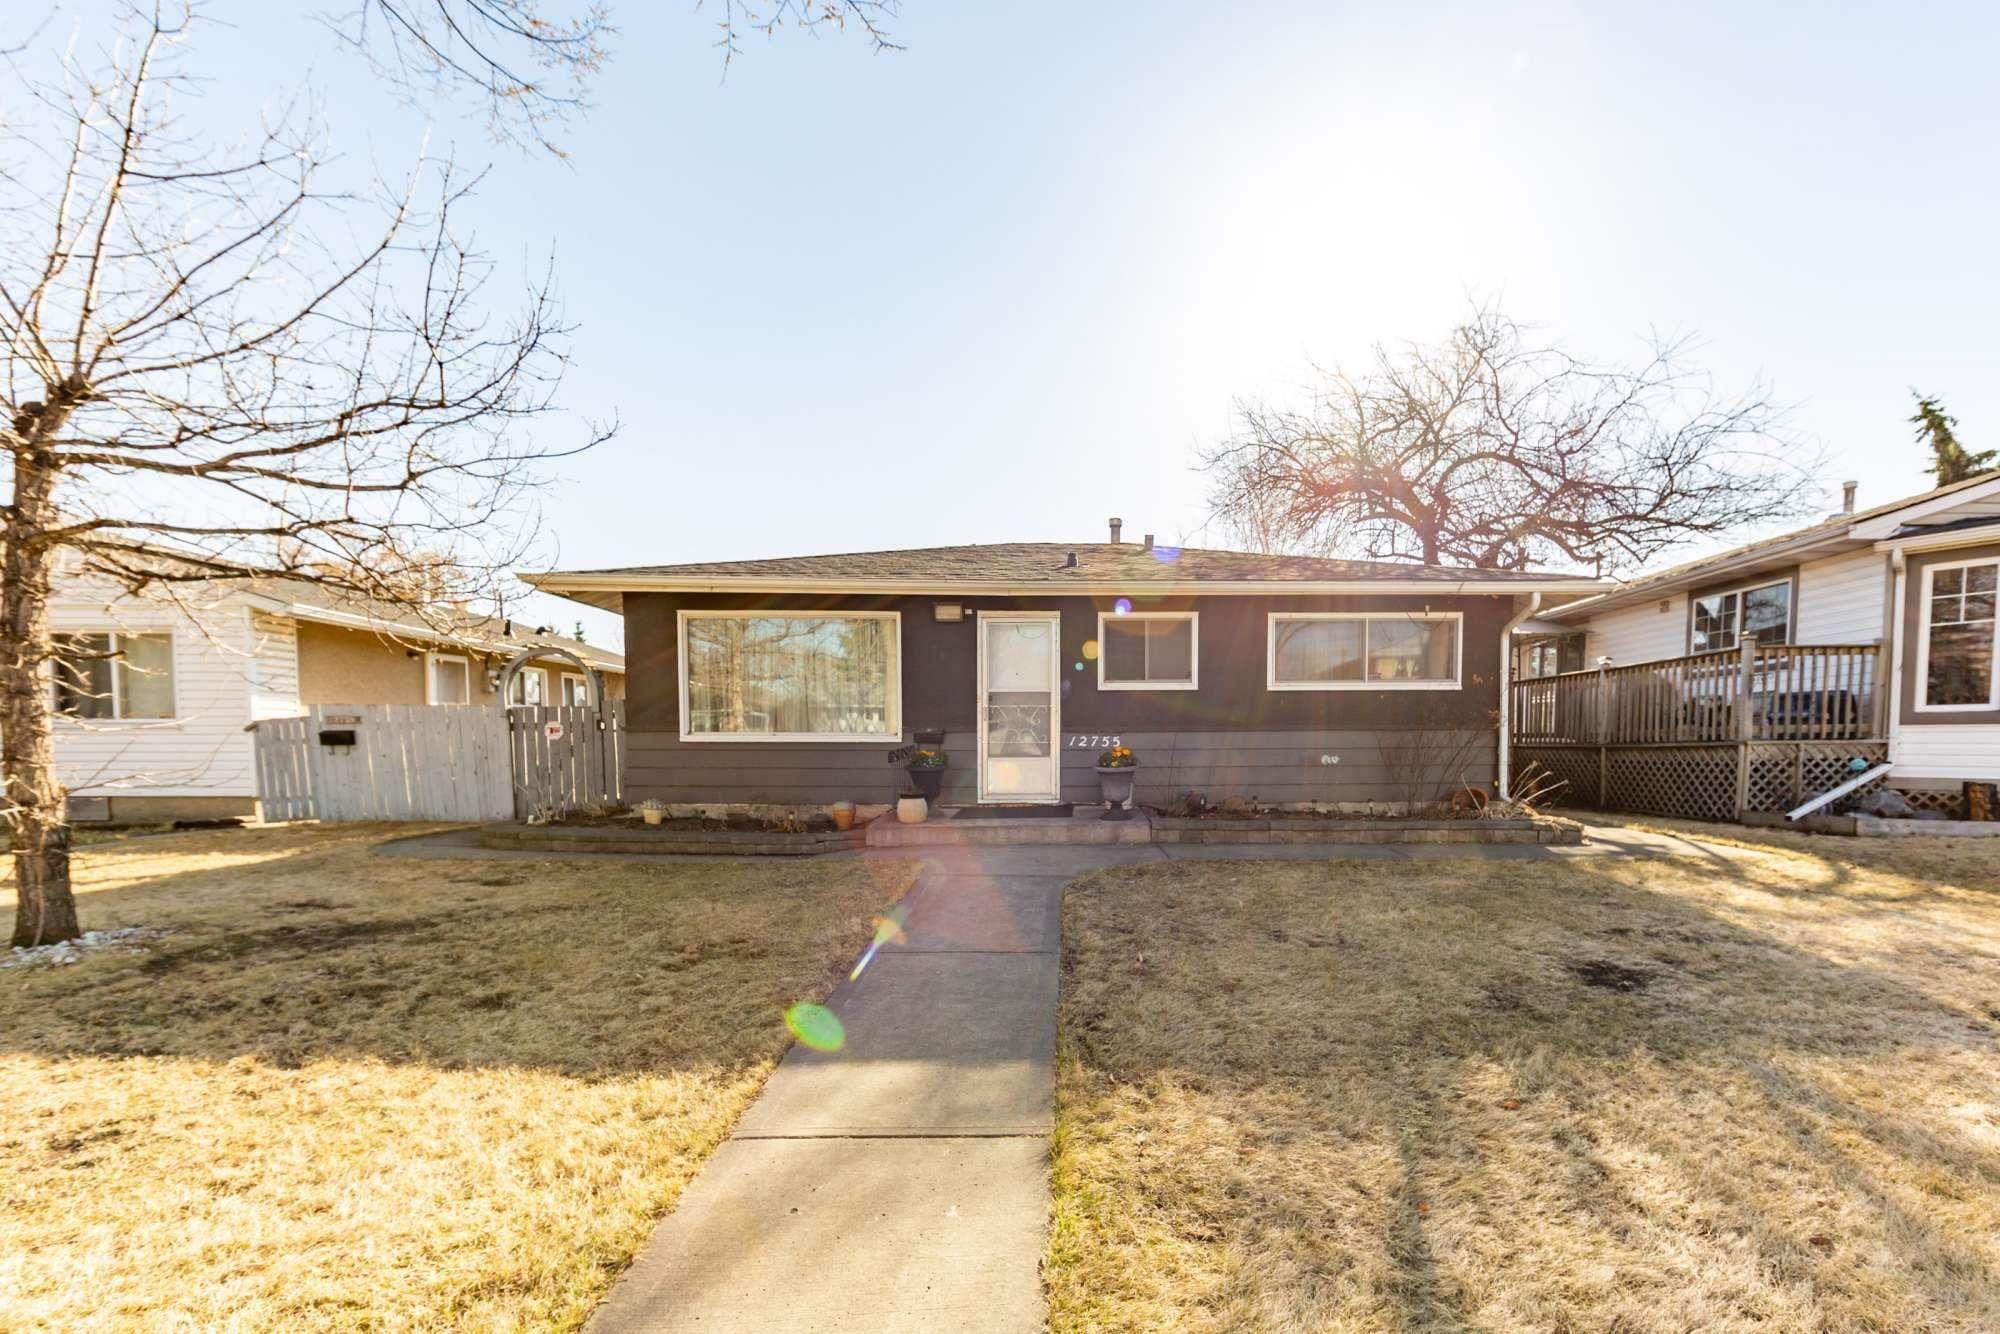 Main Photo: 12755 114 Street in Edmonton: Zone 01 House for sale : MLS®# E4255962